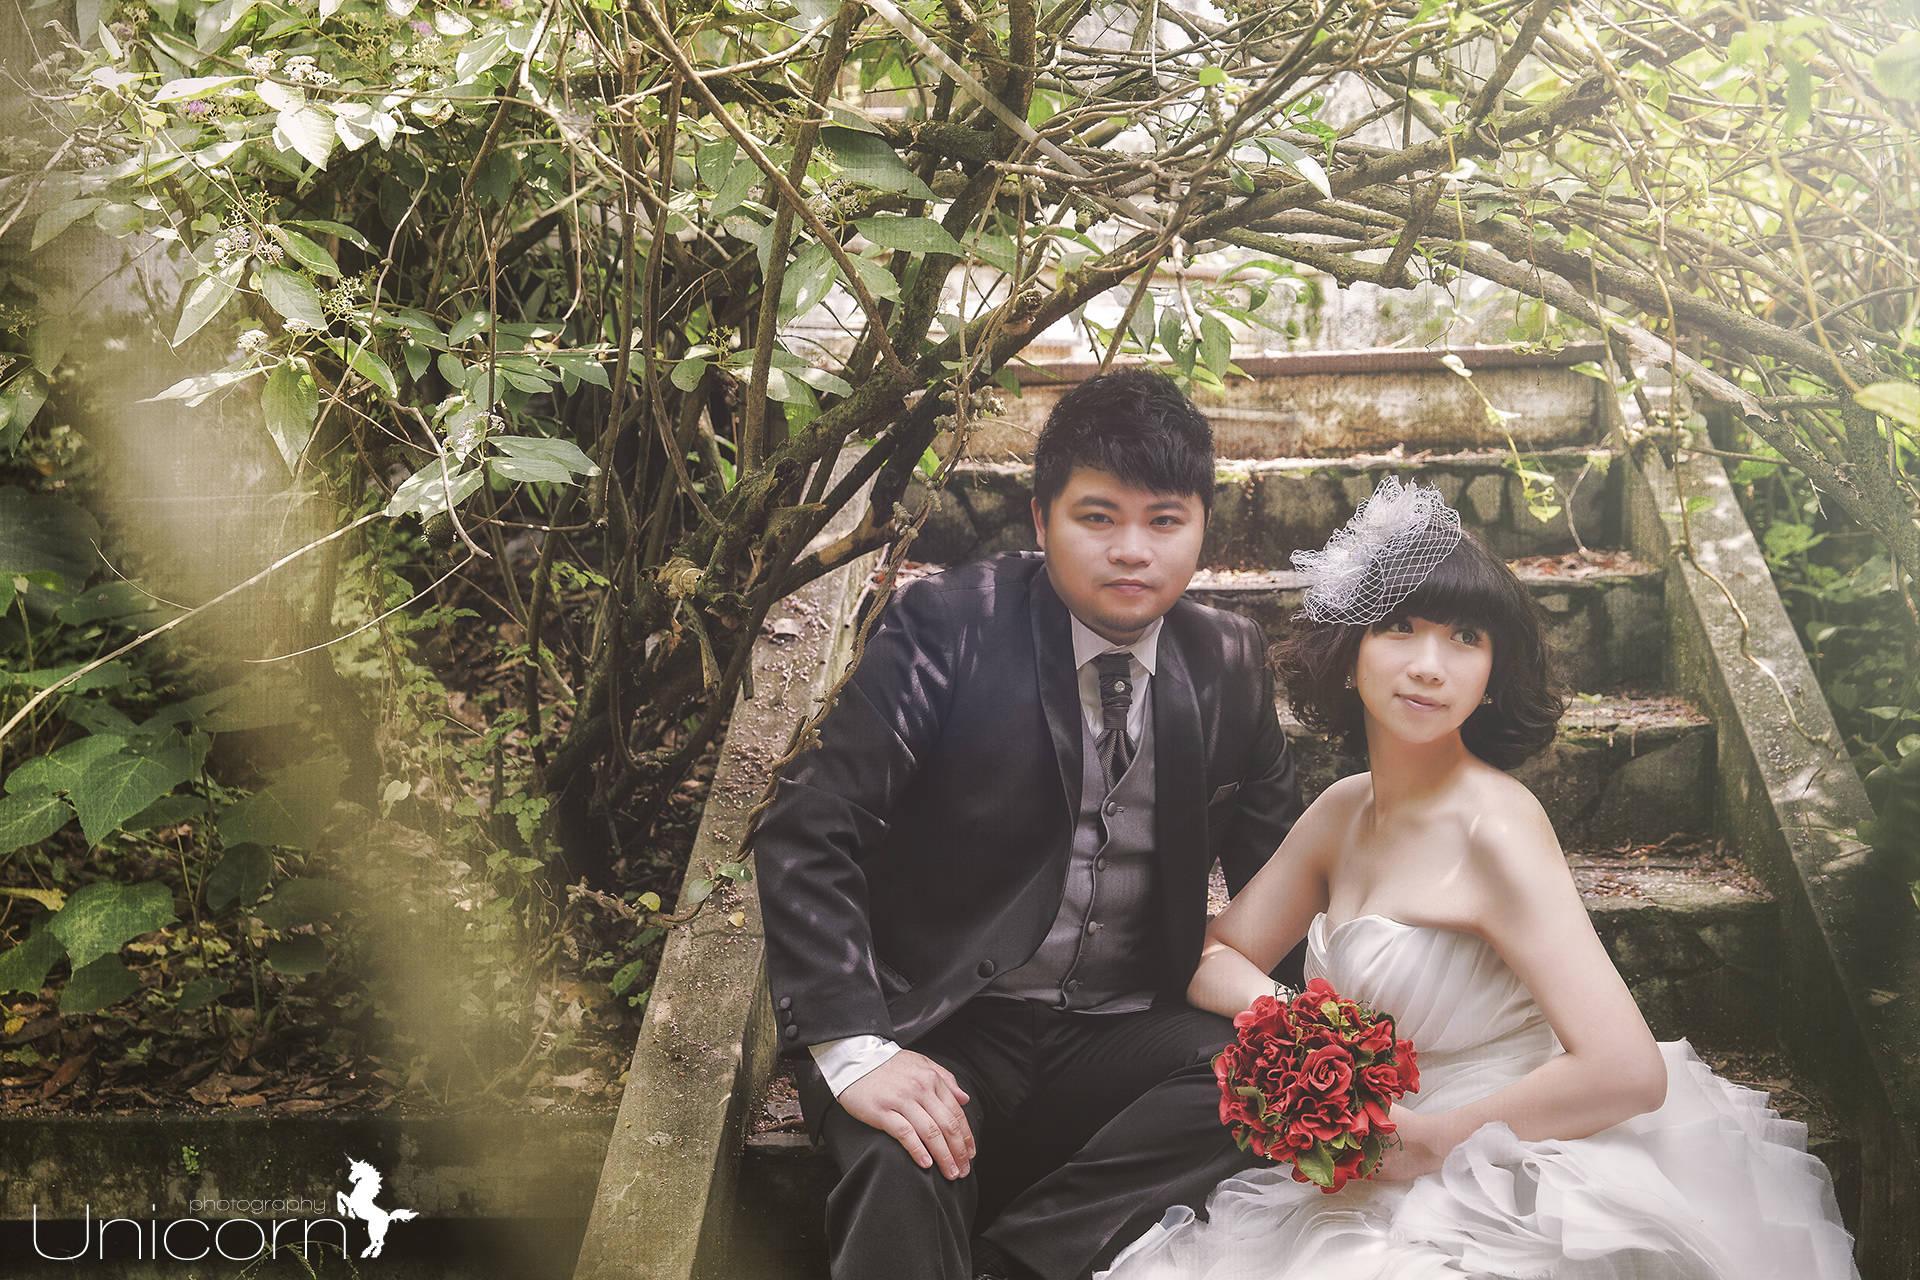 《Pre-Wedding》Kevin & Yifen 自助婚紗 / 陽明山真愛桃花源